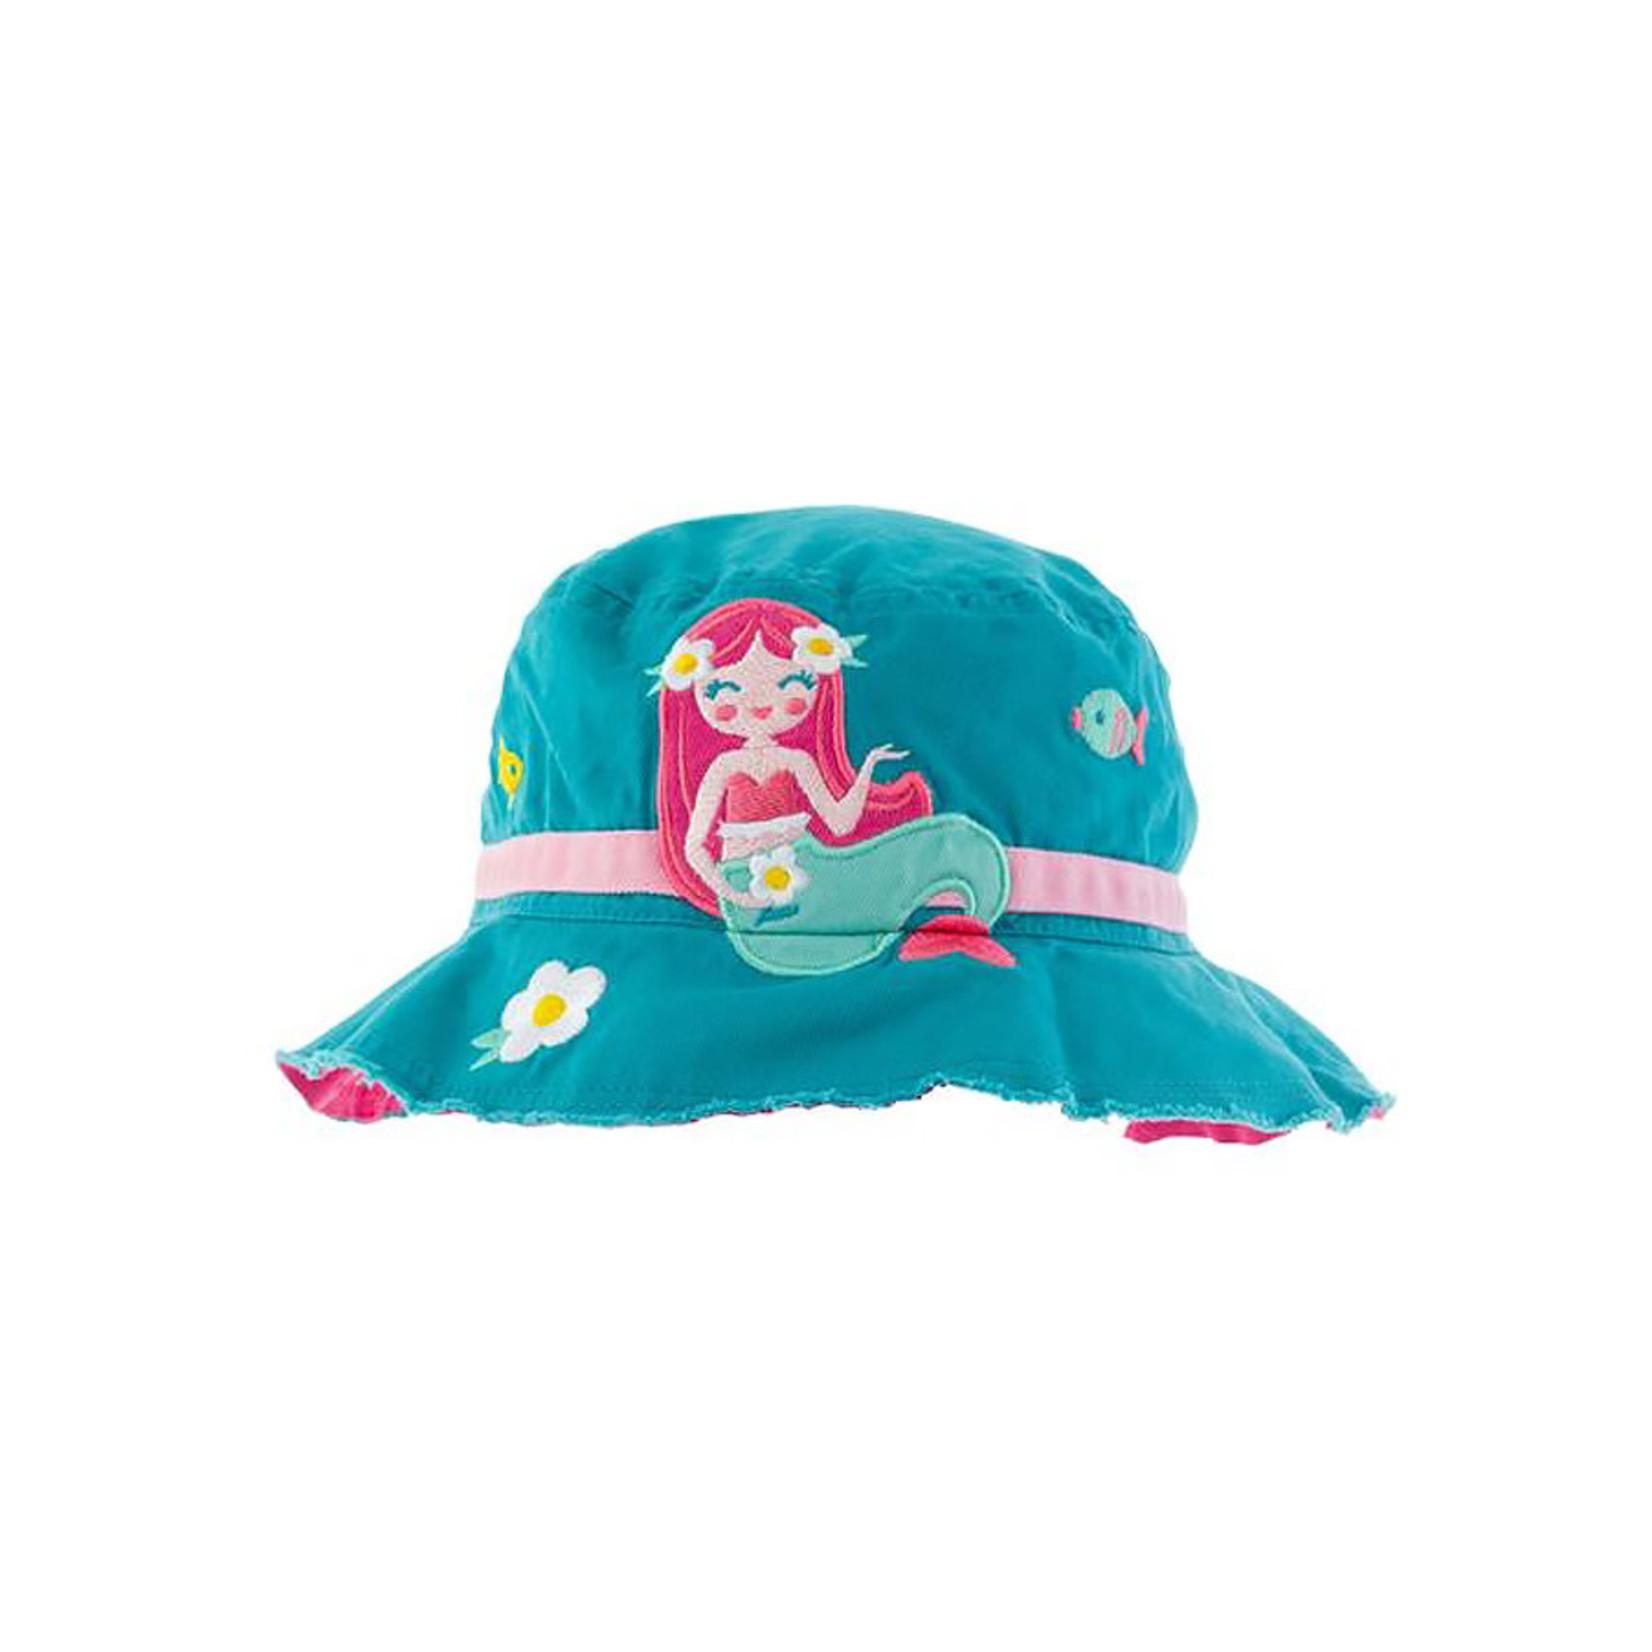 Stephen Joseph Kids Bucket Hat